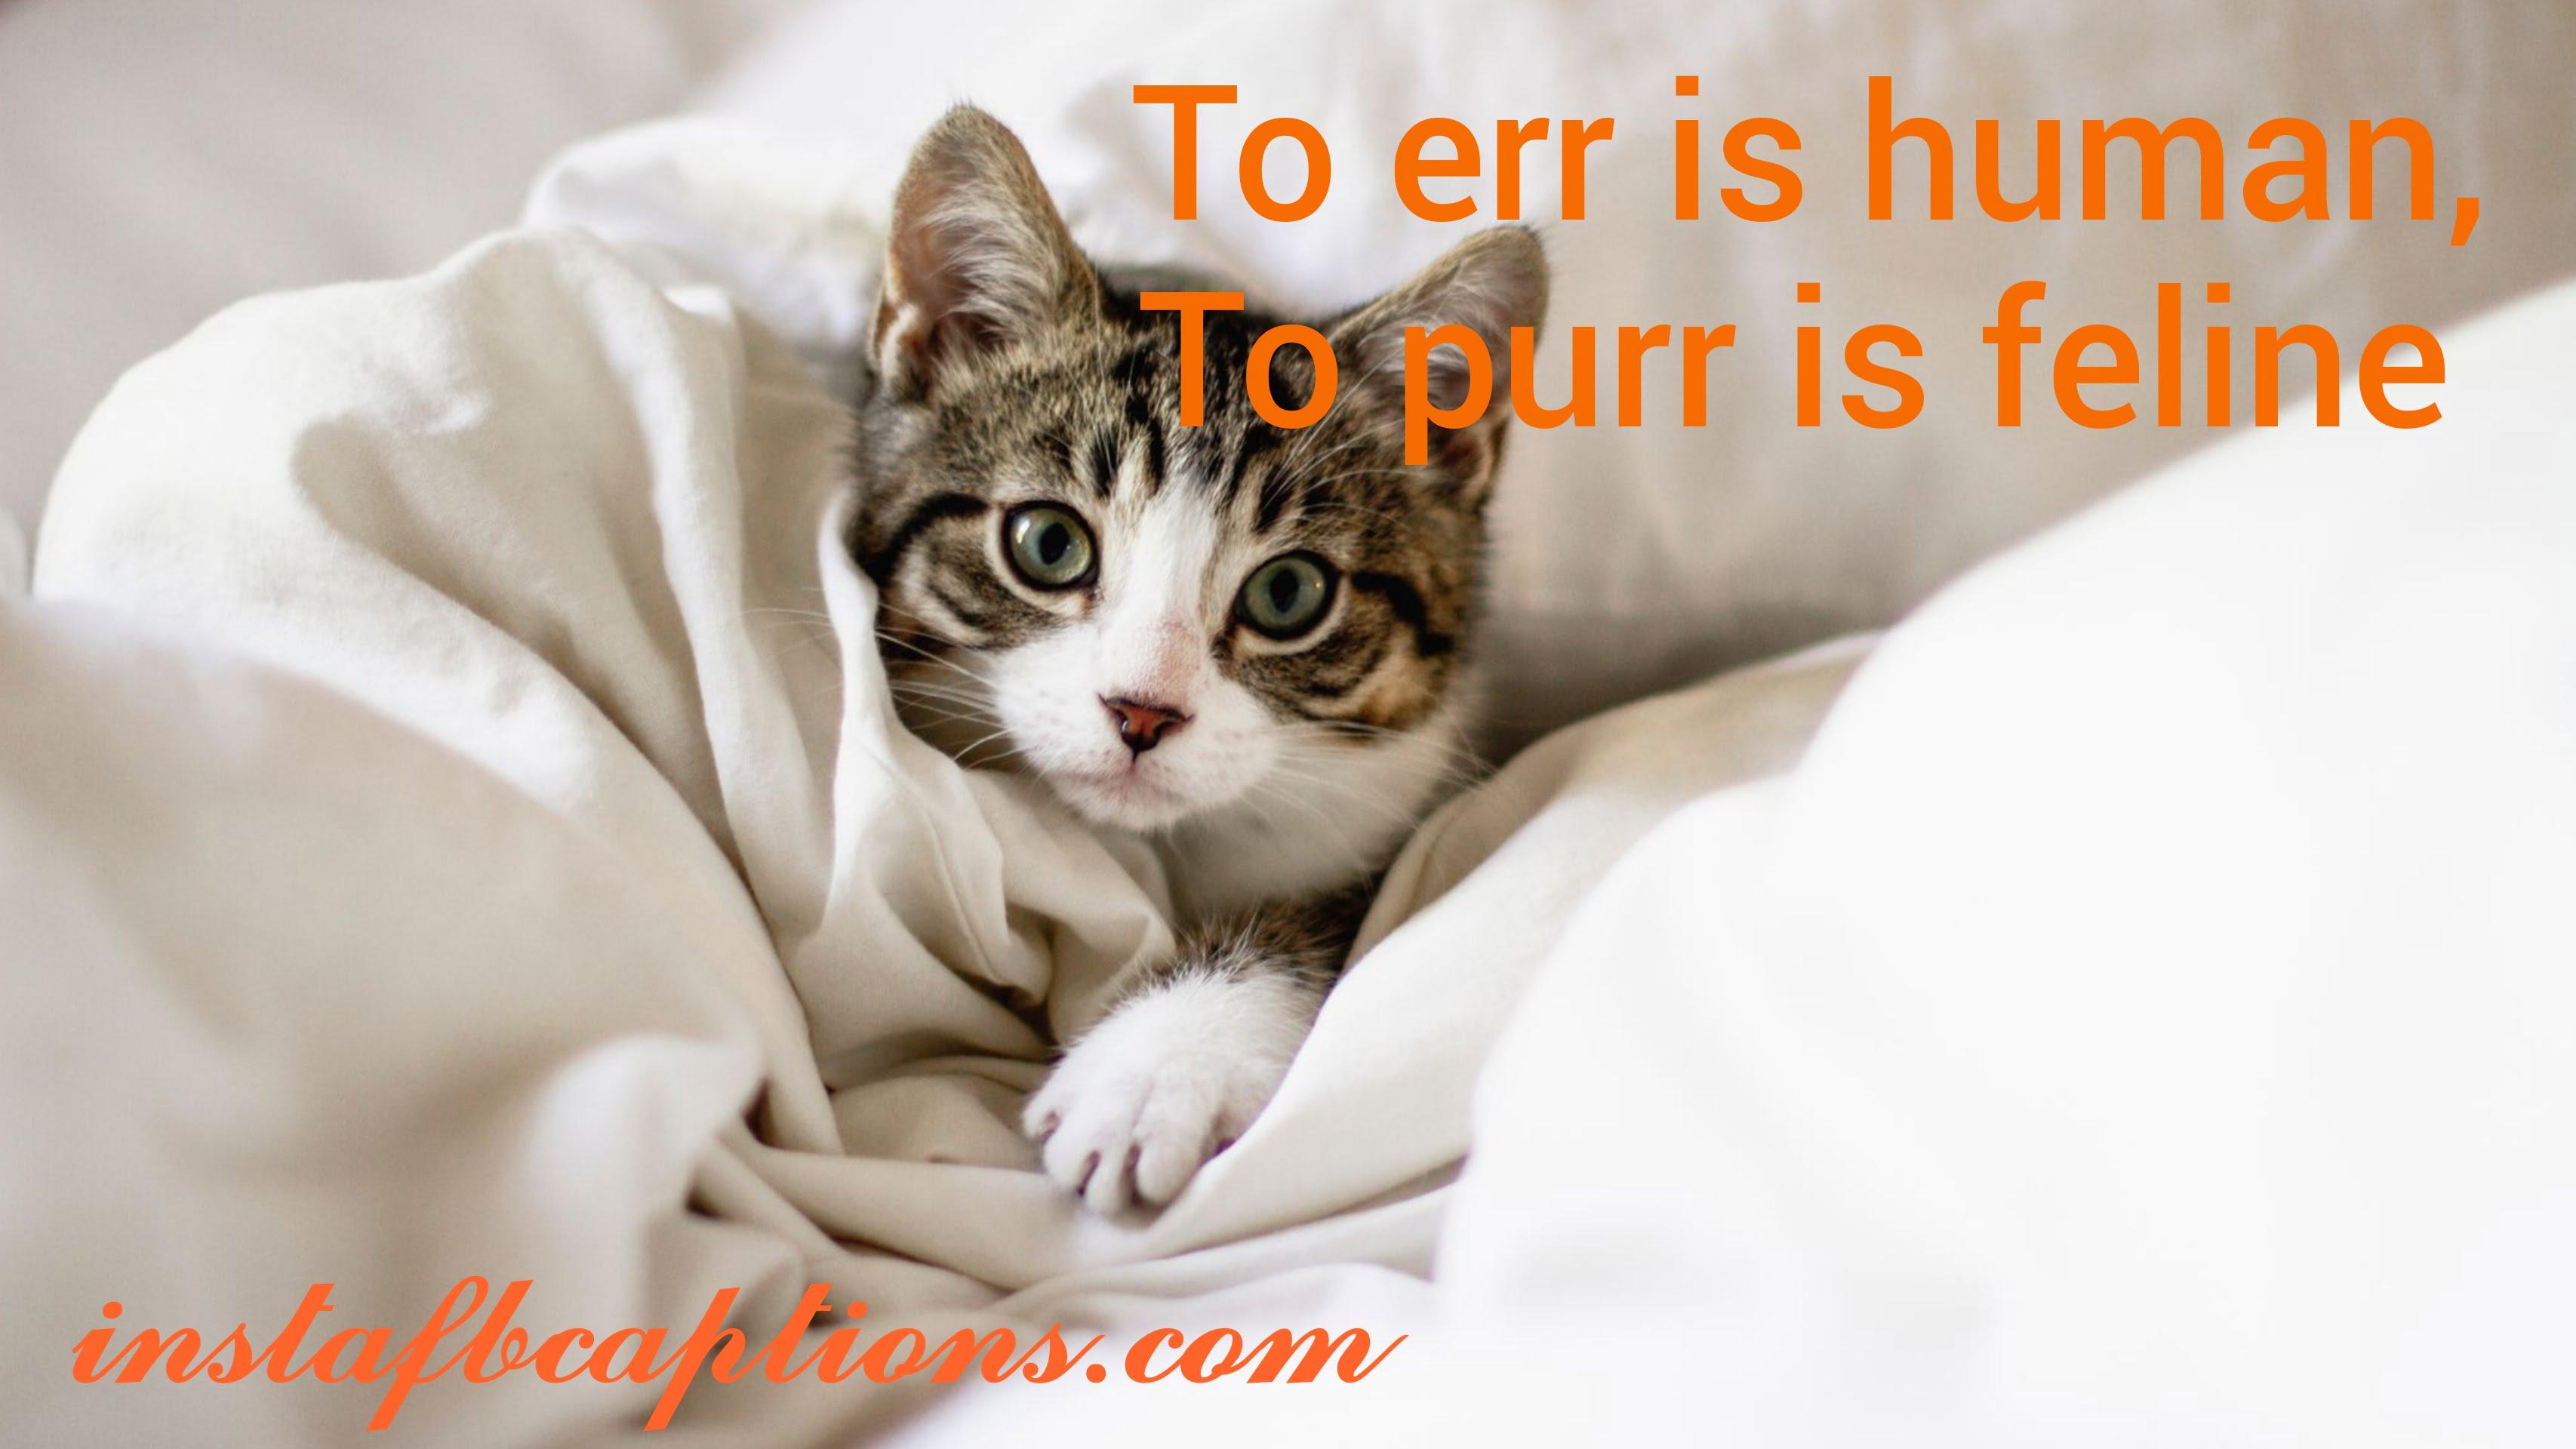 Cat Quotes For Instagram  - Cat Quotes for Instagram 1 - 150+ CATS Instagram Captions 2021